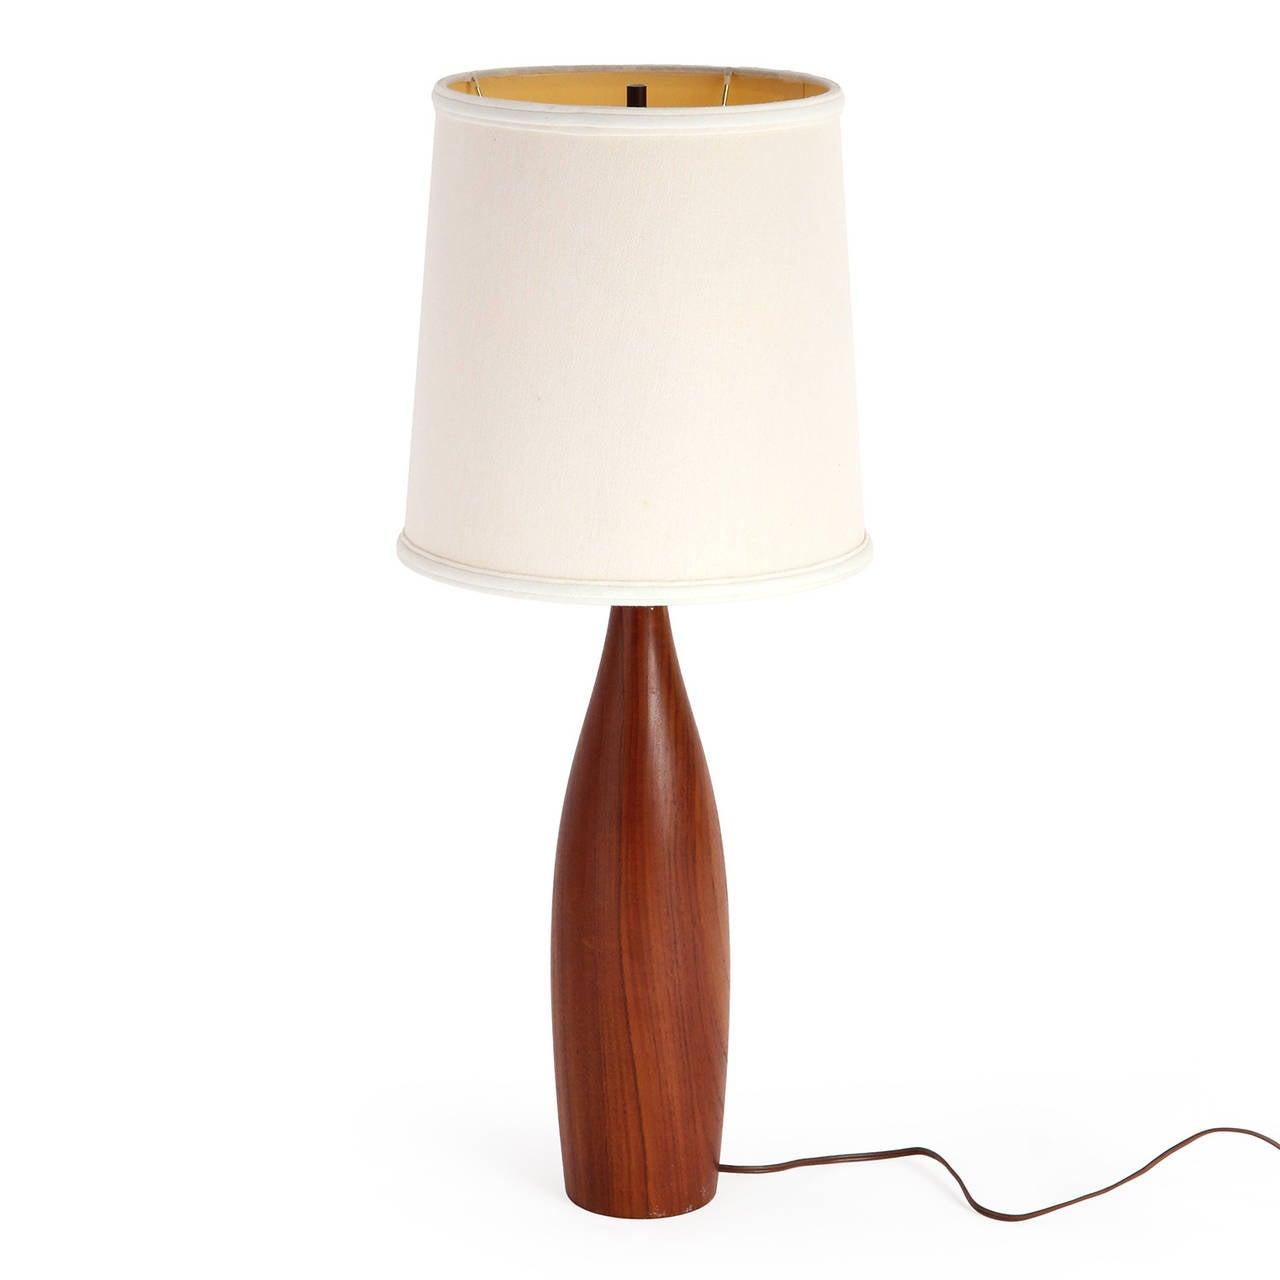 Danish Turned Teak Table Lamps For Sale at 1stdibs